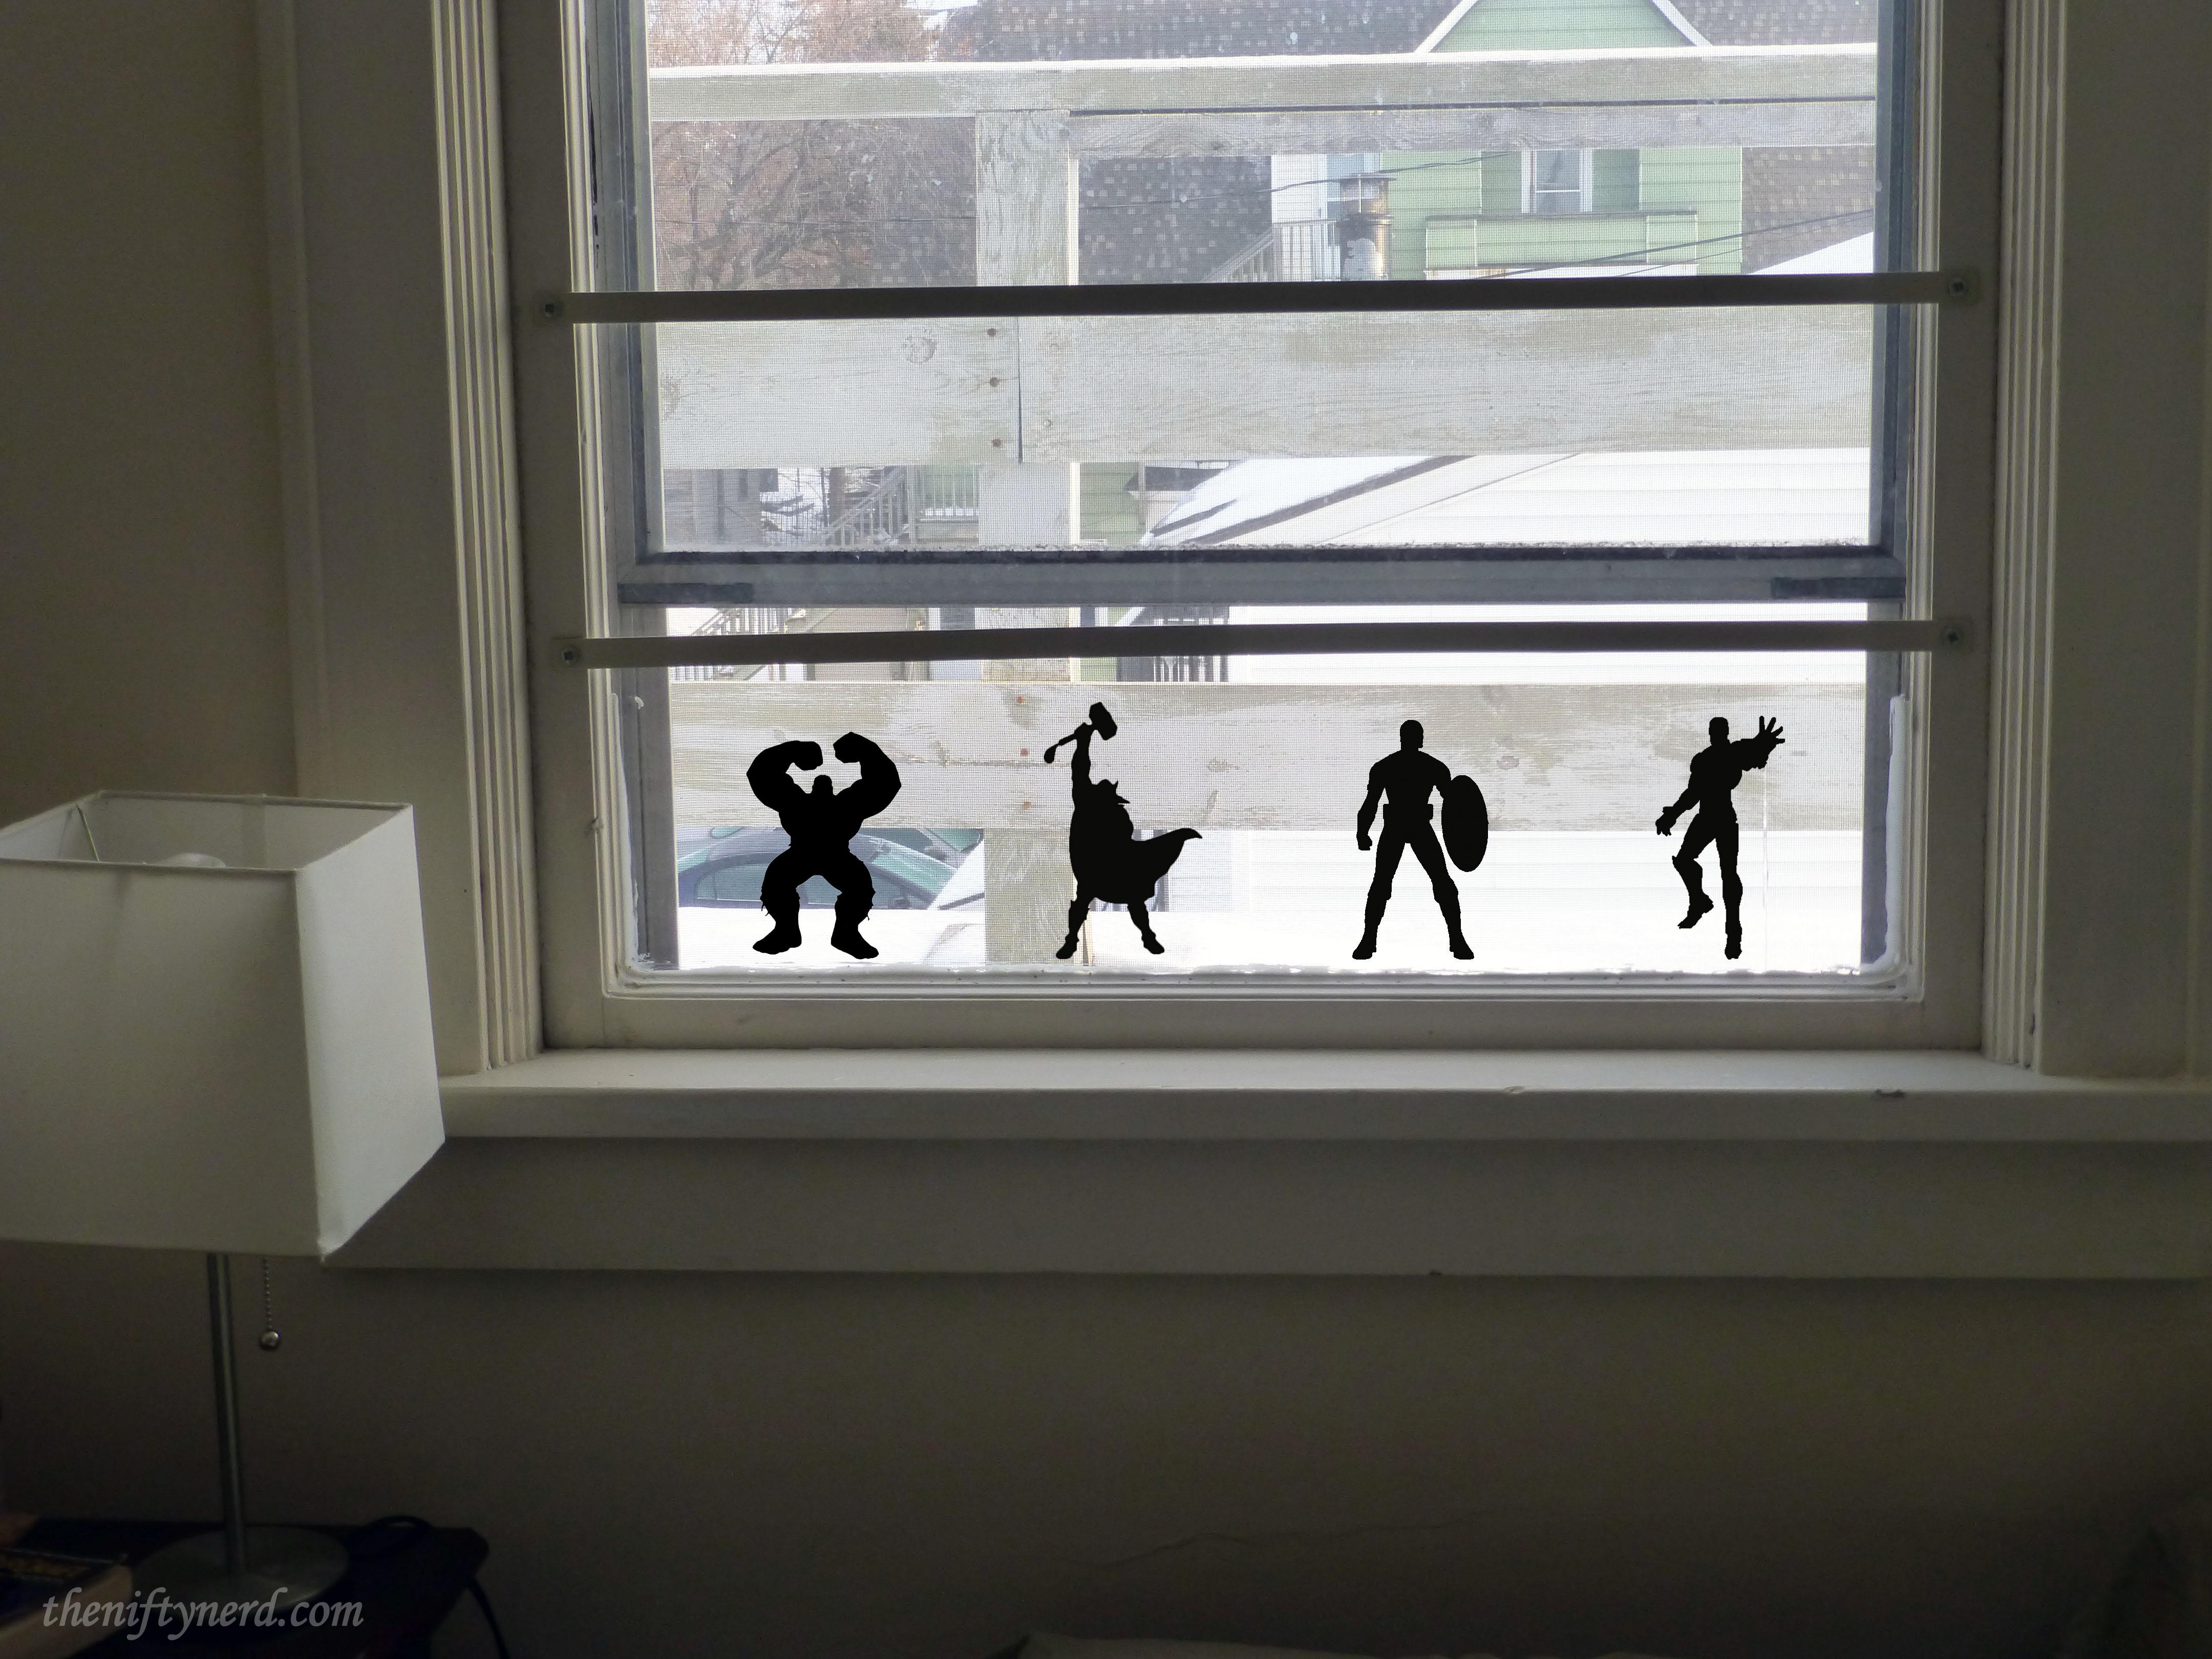 Avengers window art